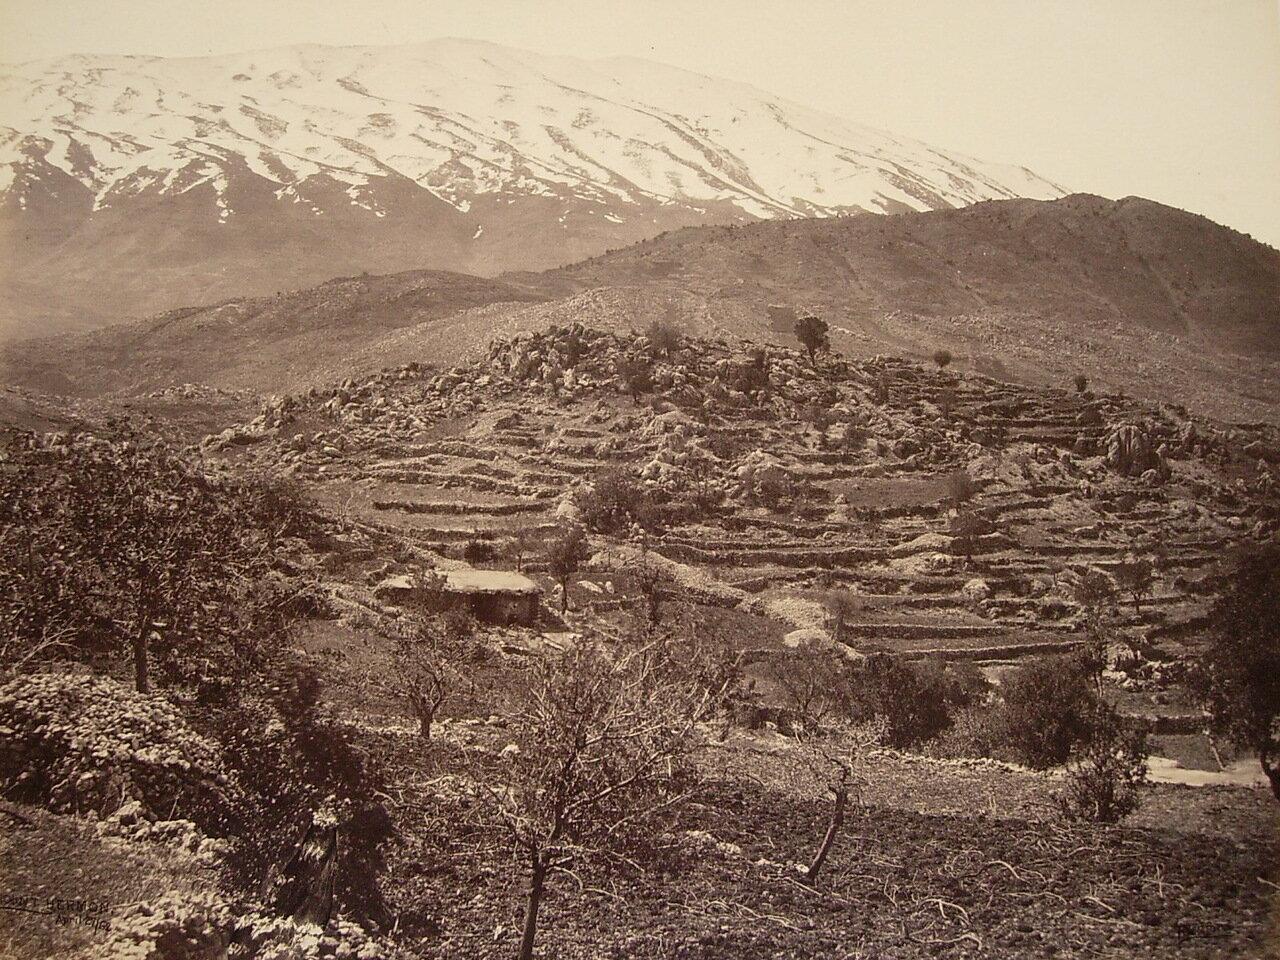 27 апреля 1862. Вид на Хермон из Рашайи